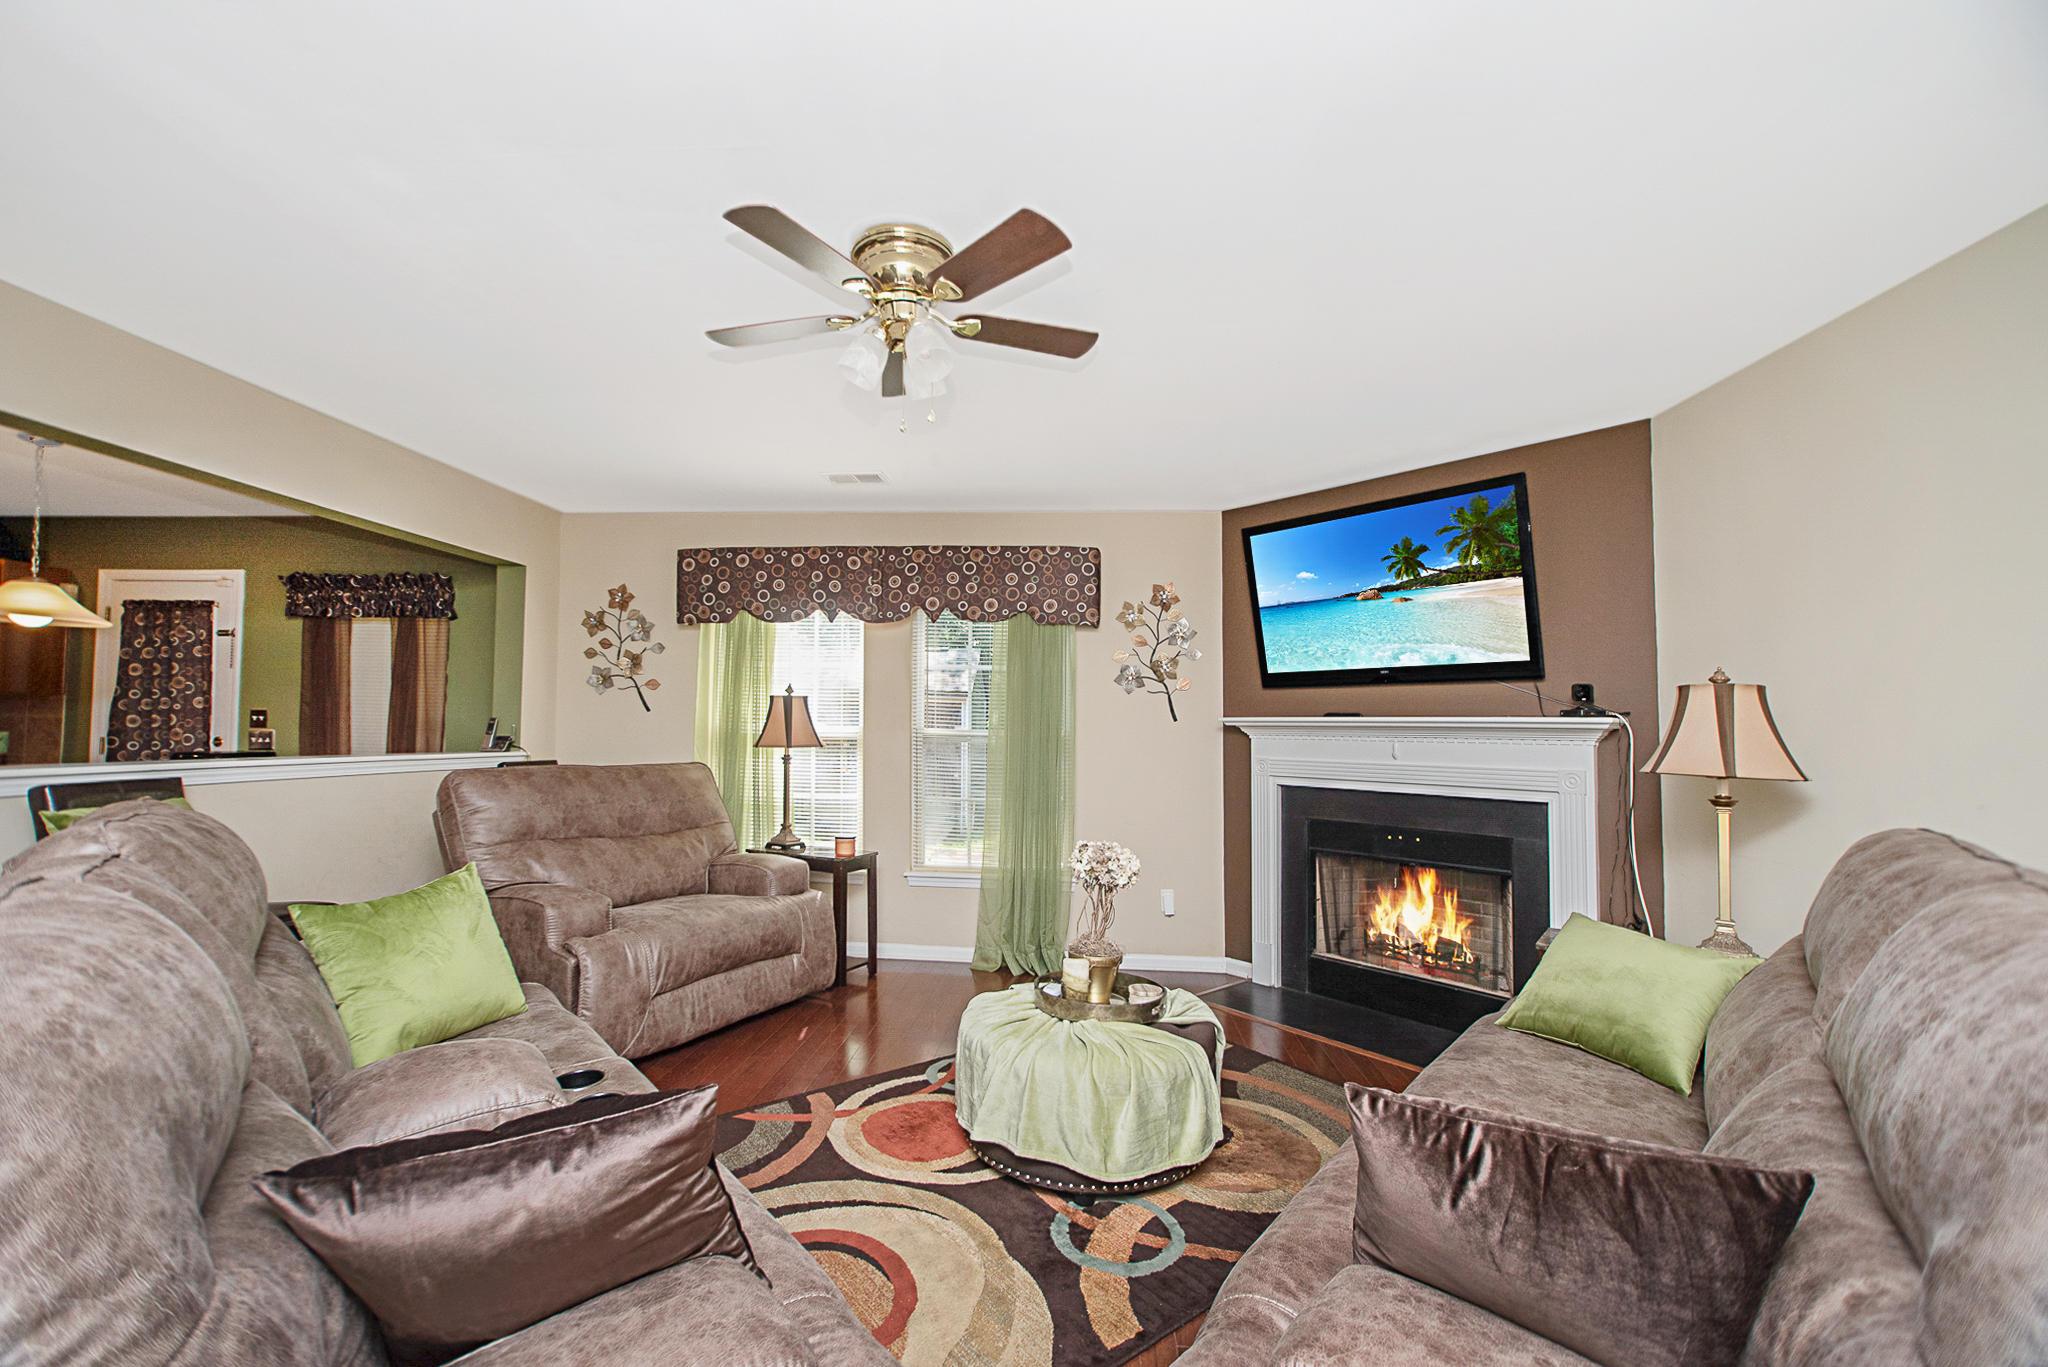 304 Breckingridge Drive Ladson, SC 29456